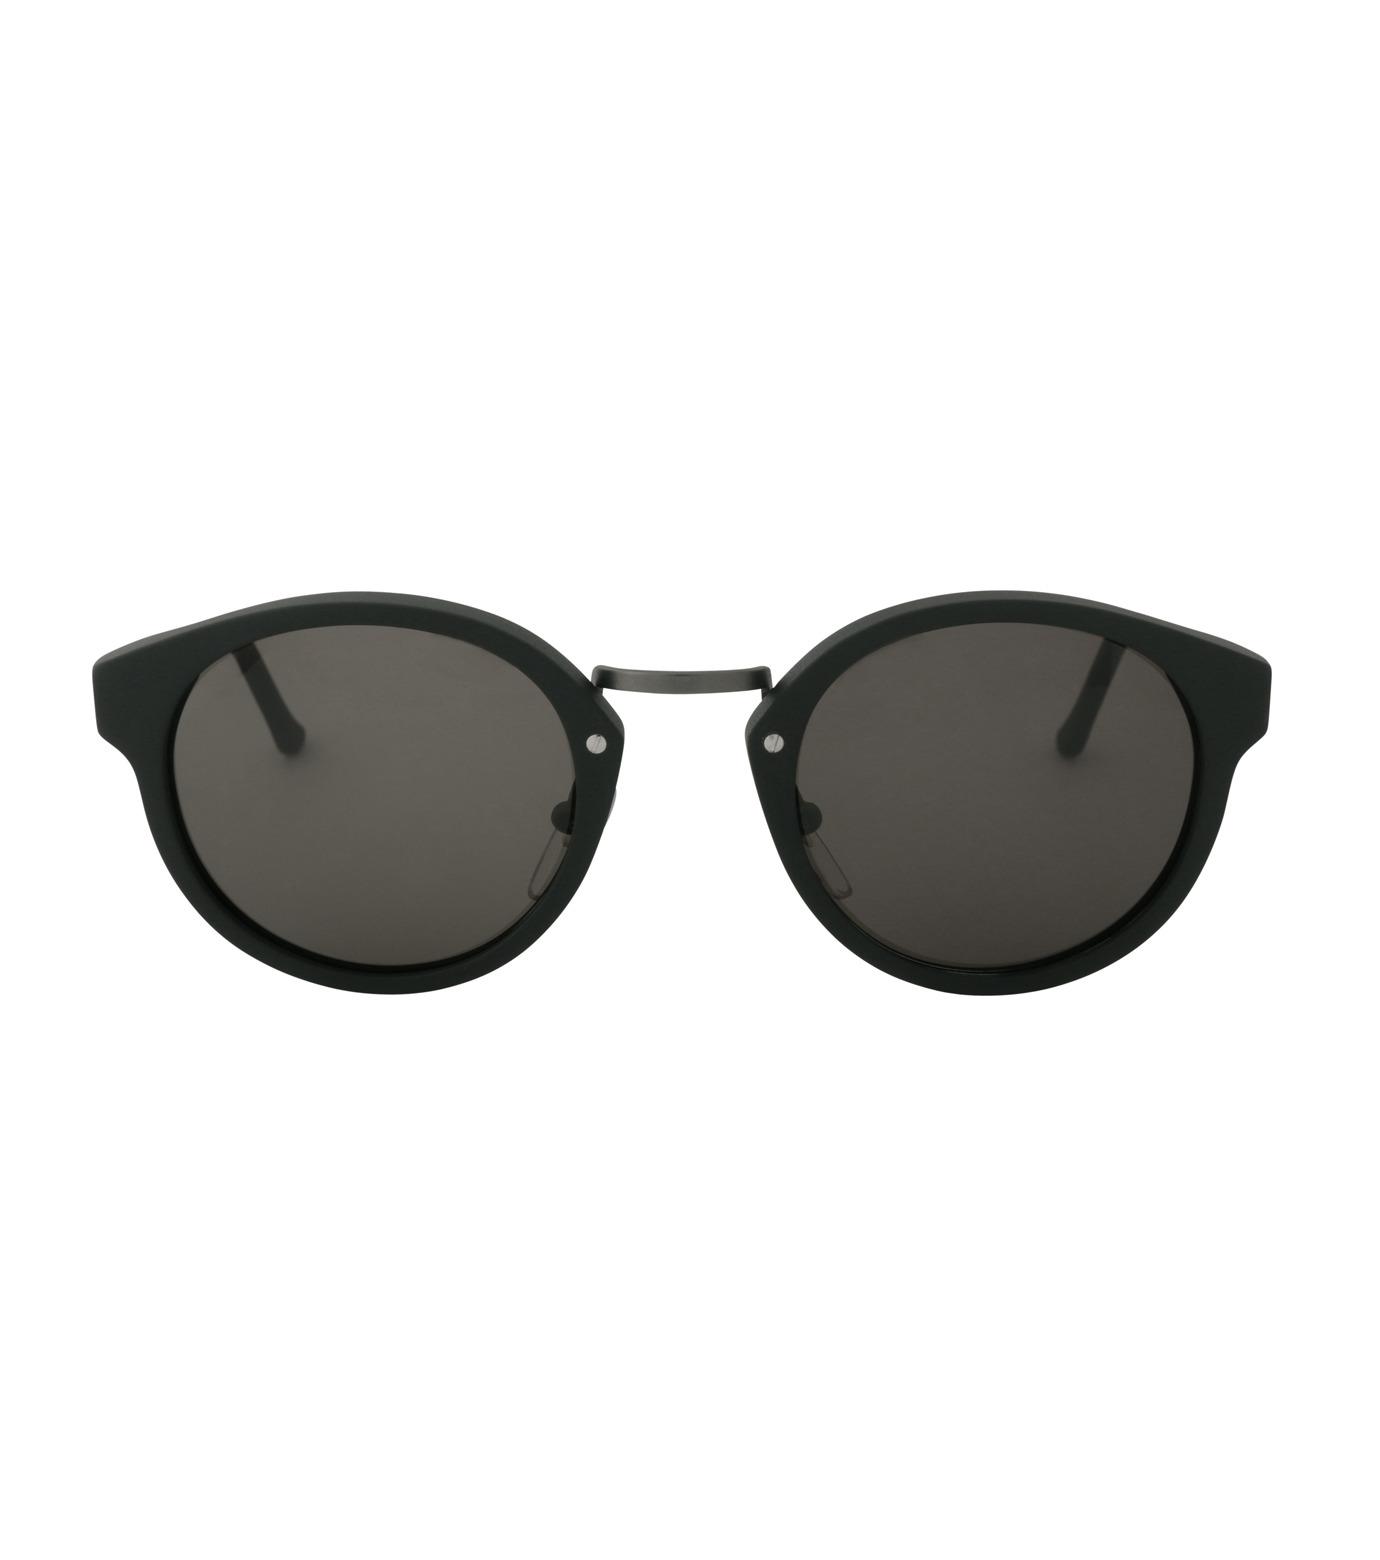 SUPER(スーパー)のPANAMA MAT BLACK-BLACK(アイウェア/eyewear)-SPRXXXX045-13 拡大詳細画像3